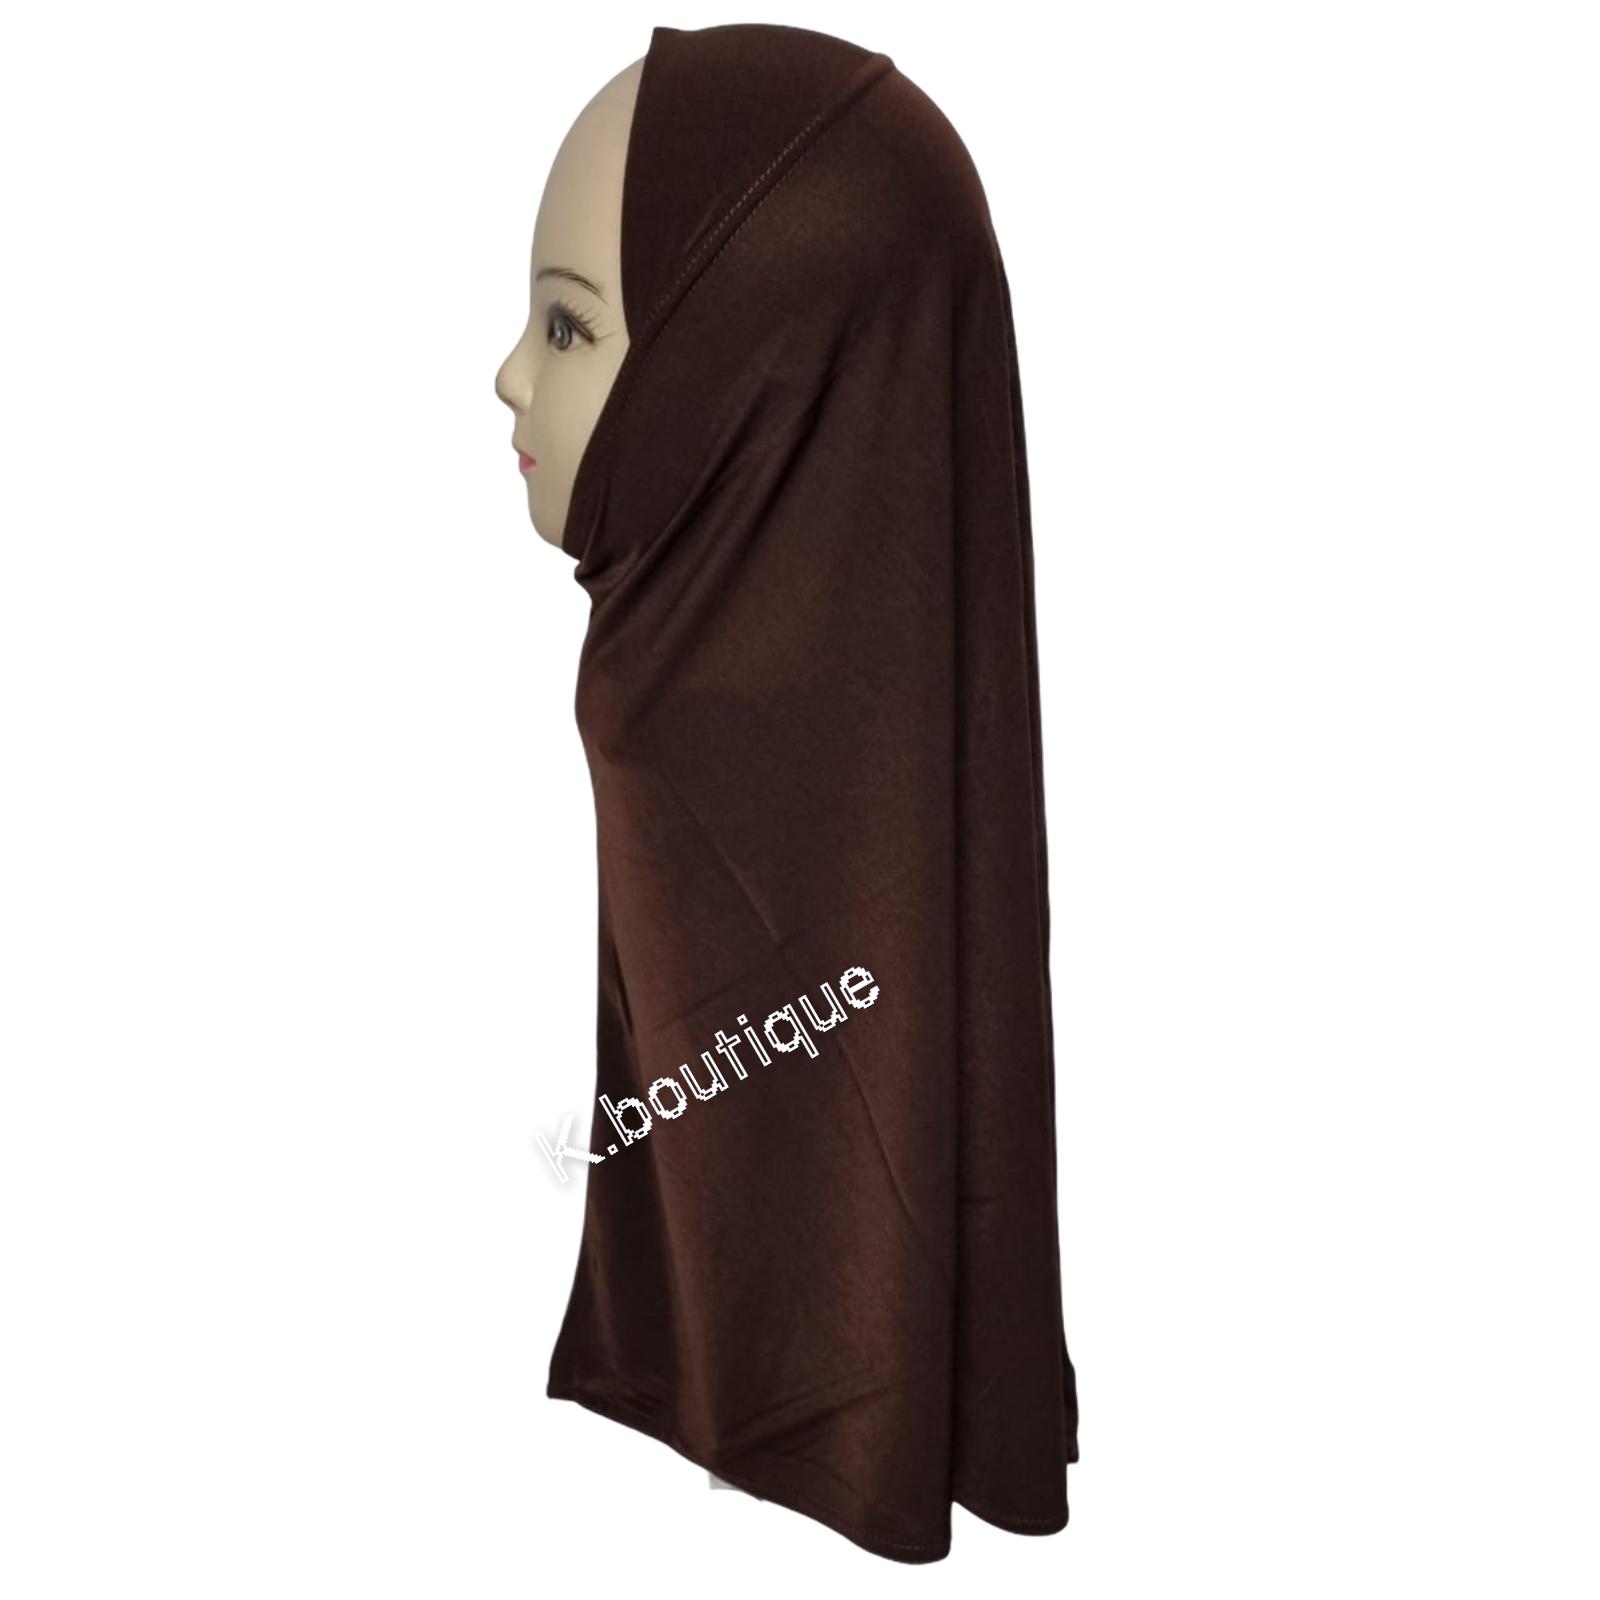 Plain One Piece Hijab Fits Girls Teenagers Adult Stretchy lycra School Hijab Uk